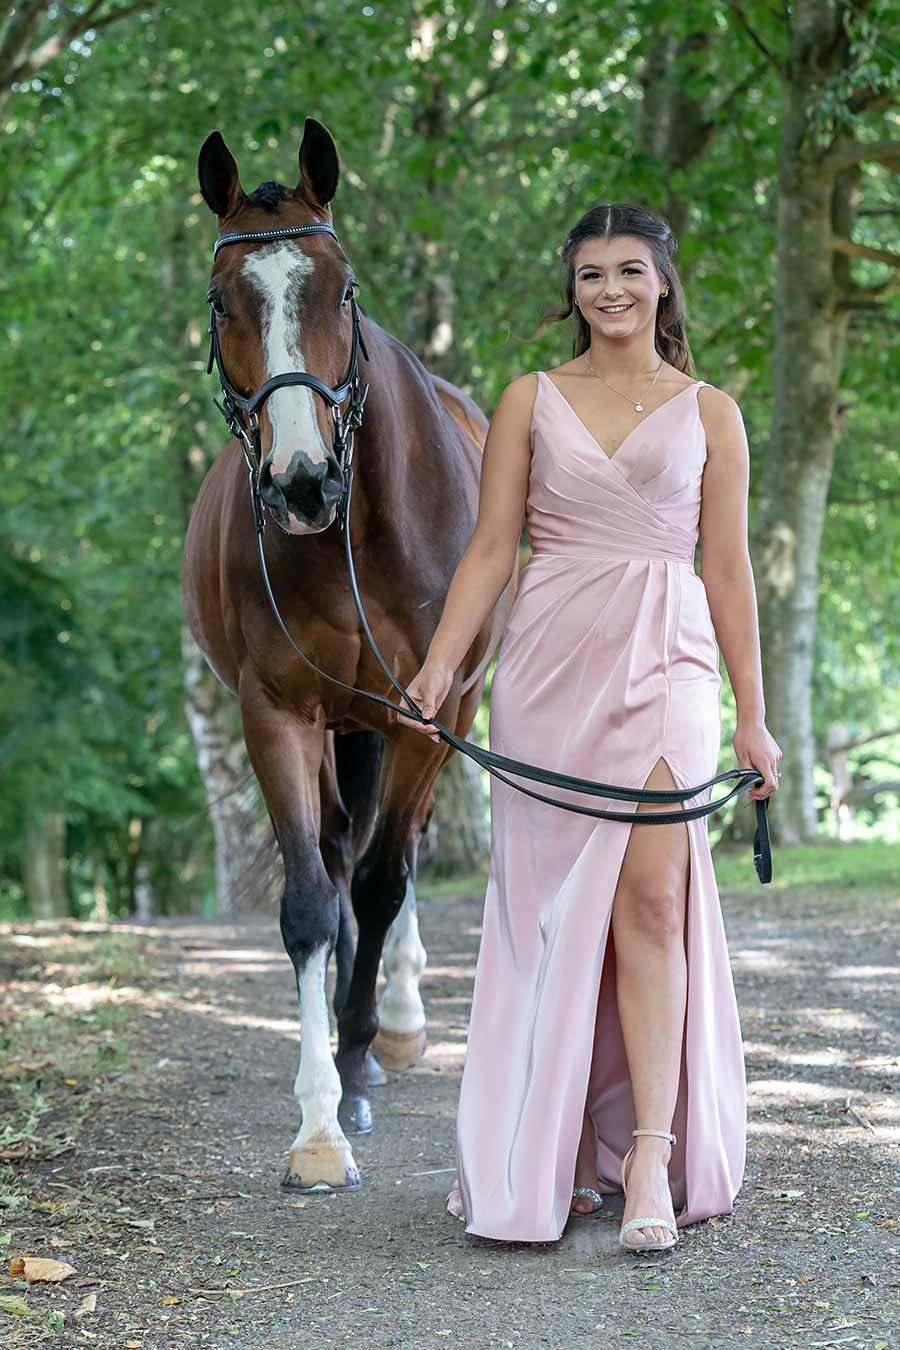 Equestrian Services - Equestrian Photo Shoots